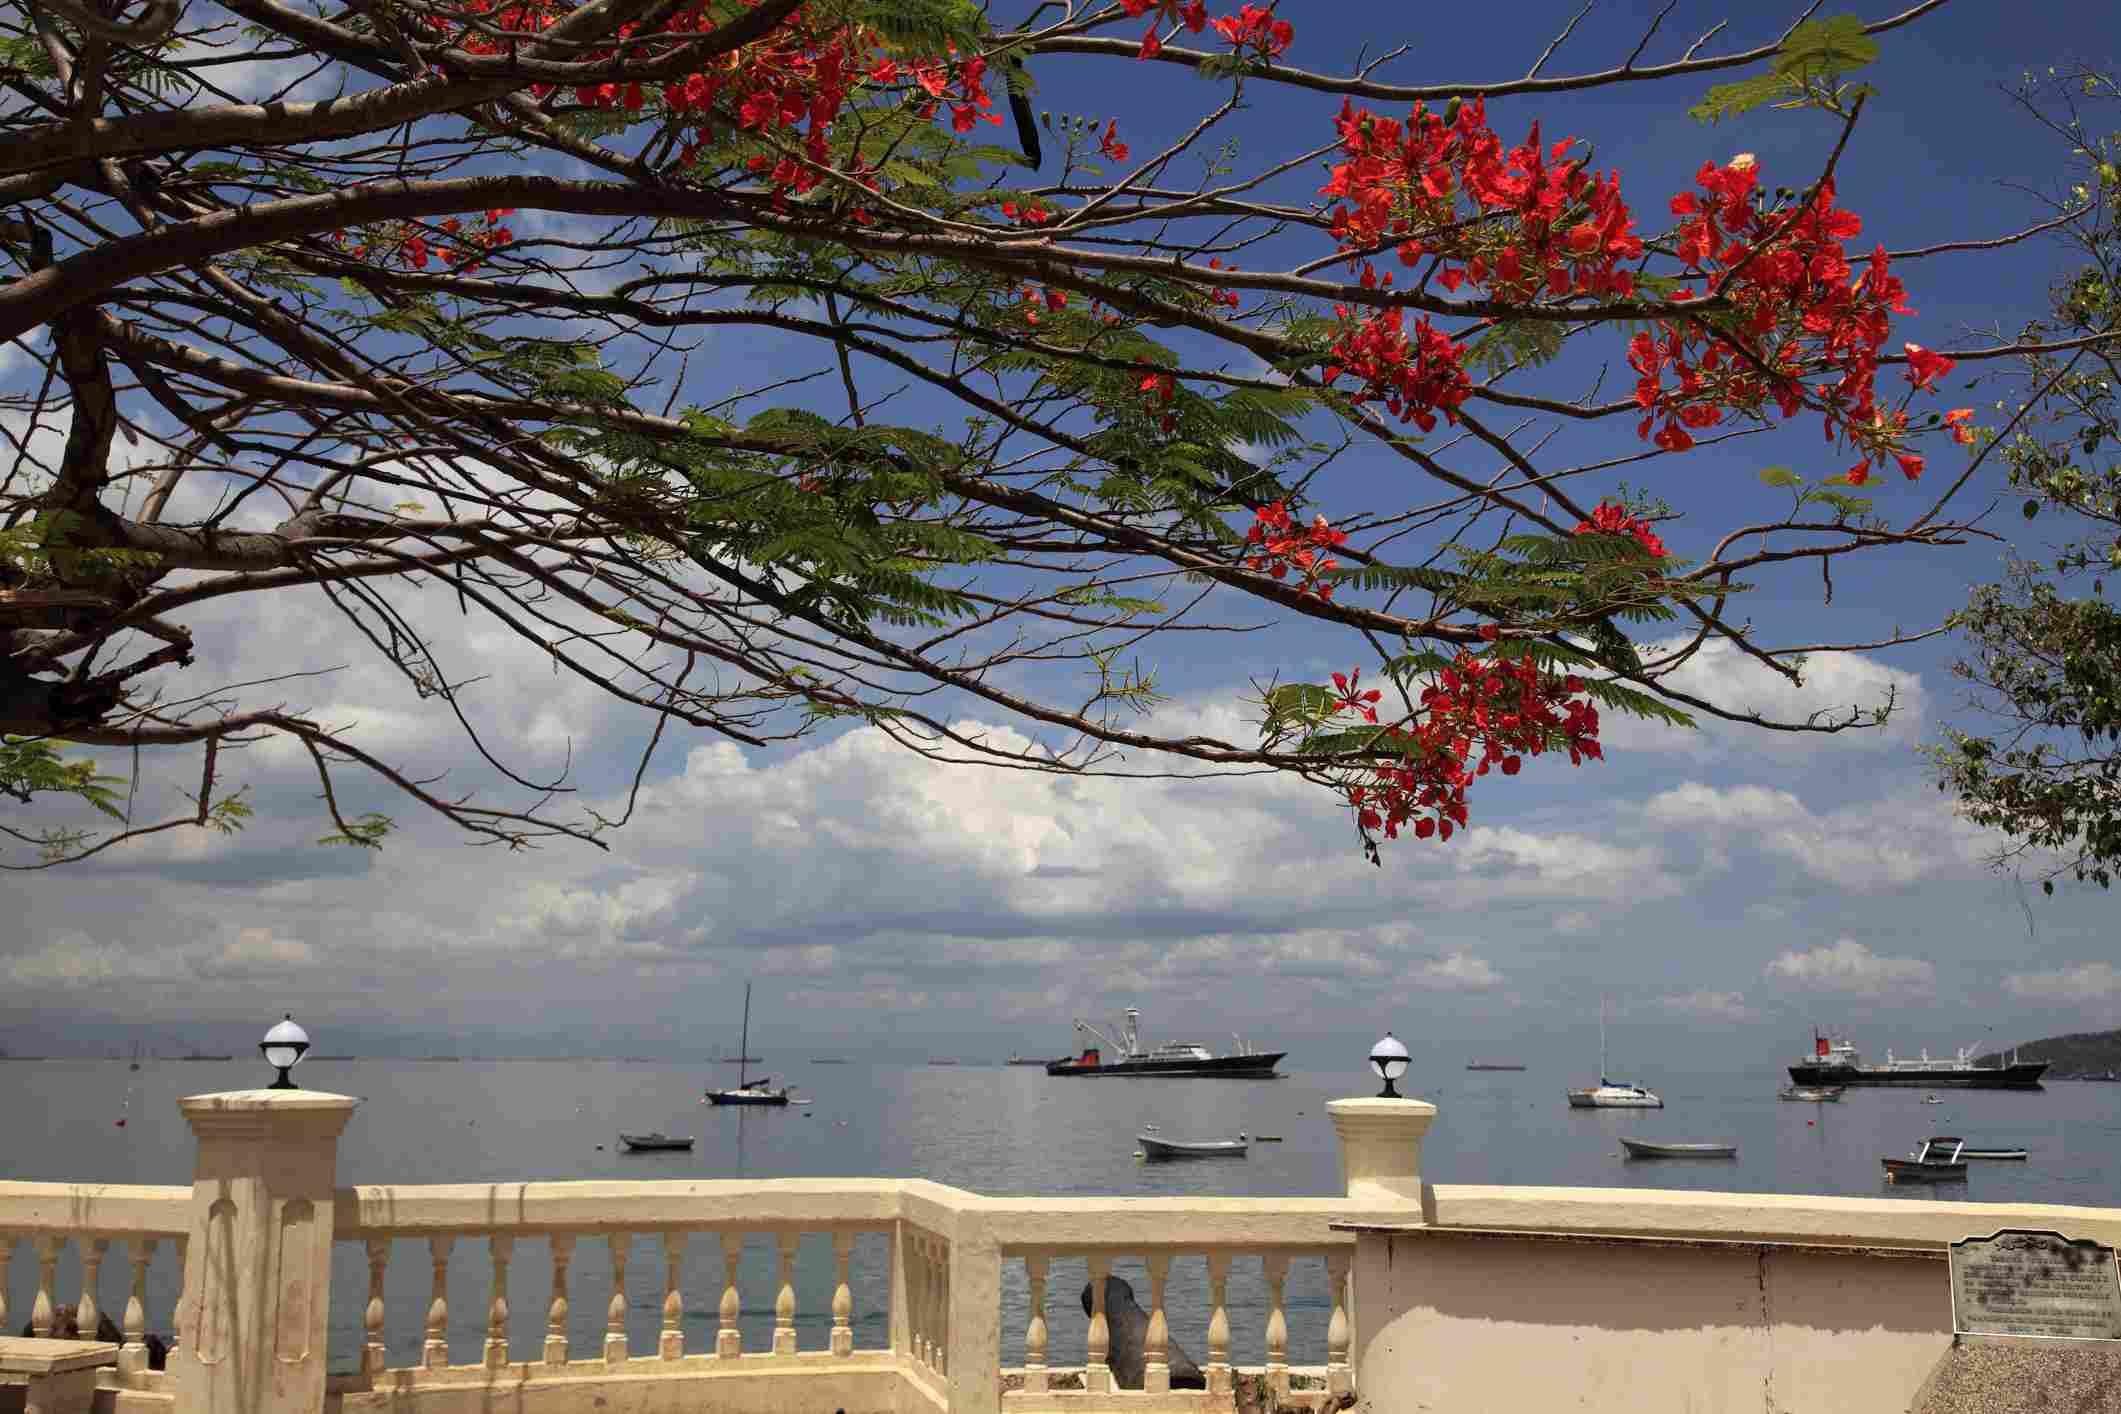 Waterfront promenade on the shore of Taboga Island